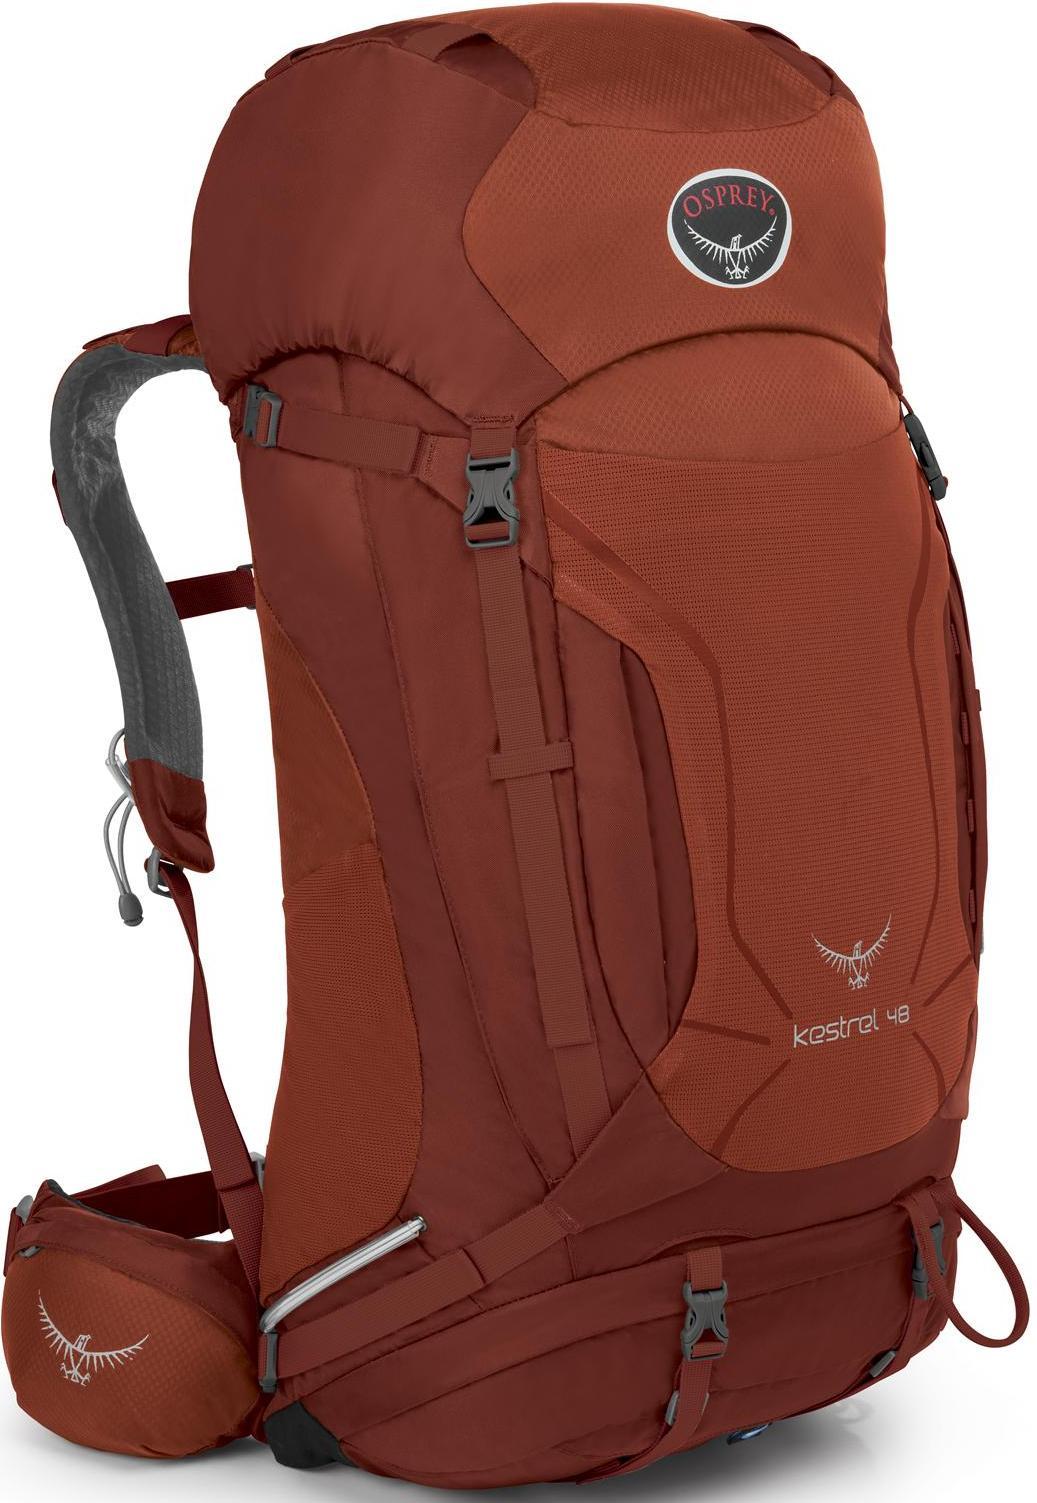 Osprey Kestrel 48 小鷹輕量登山背包/健行背包 附贈背包套 新款 48升 磚紅/台北山水